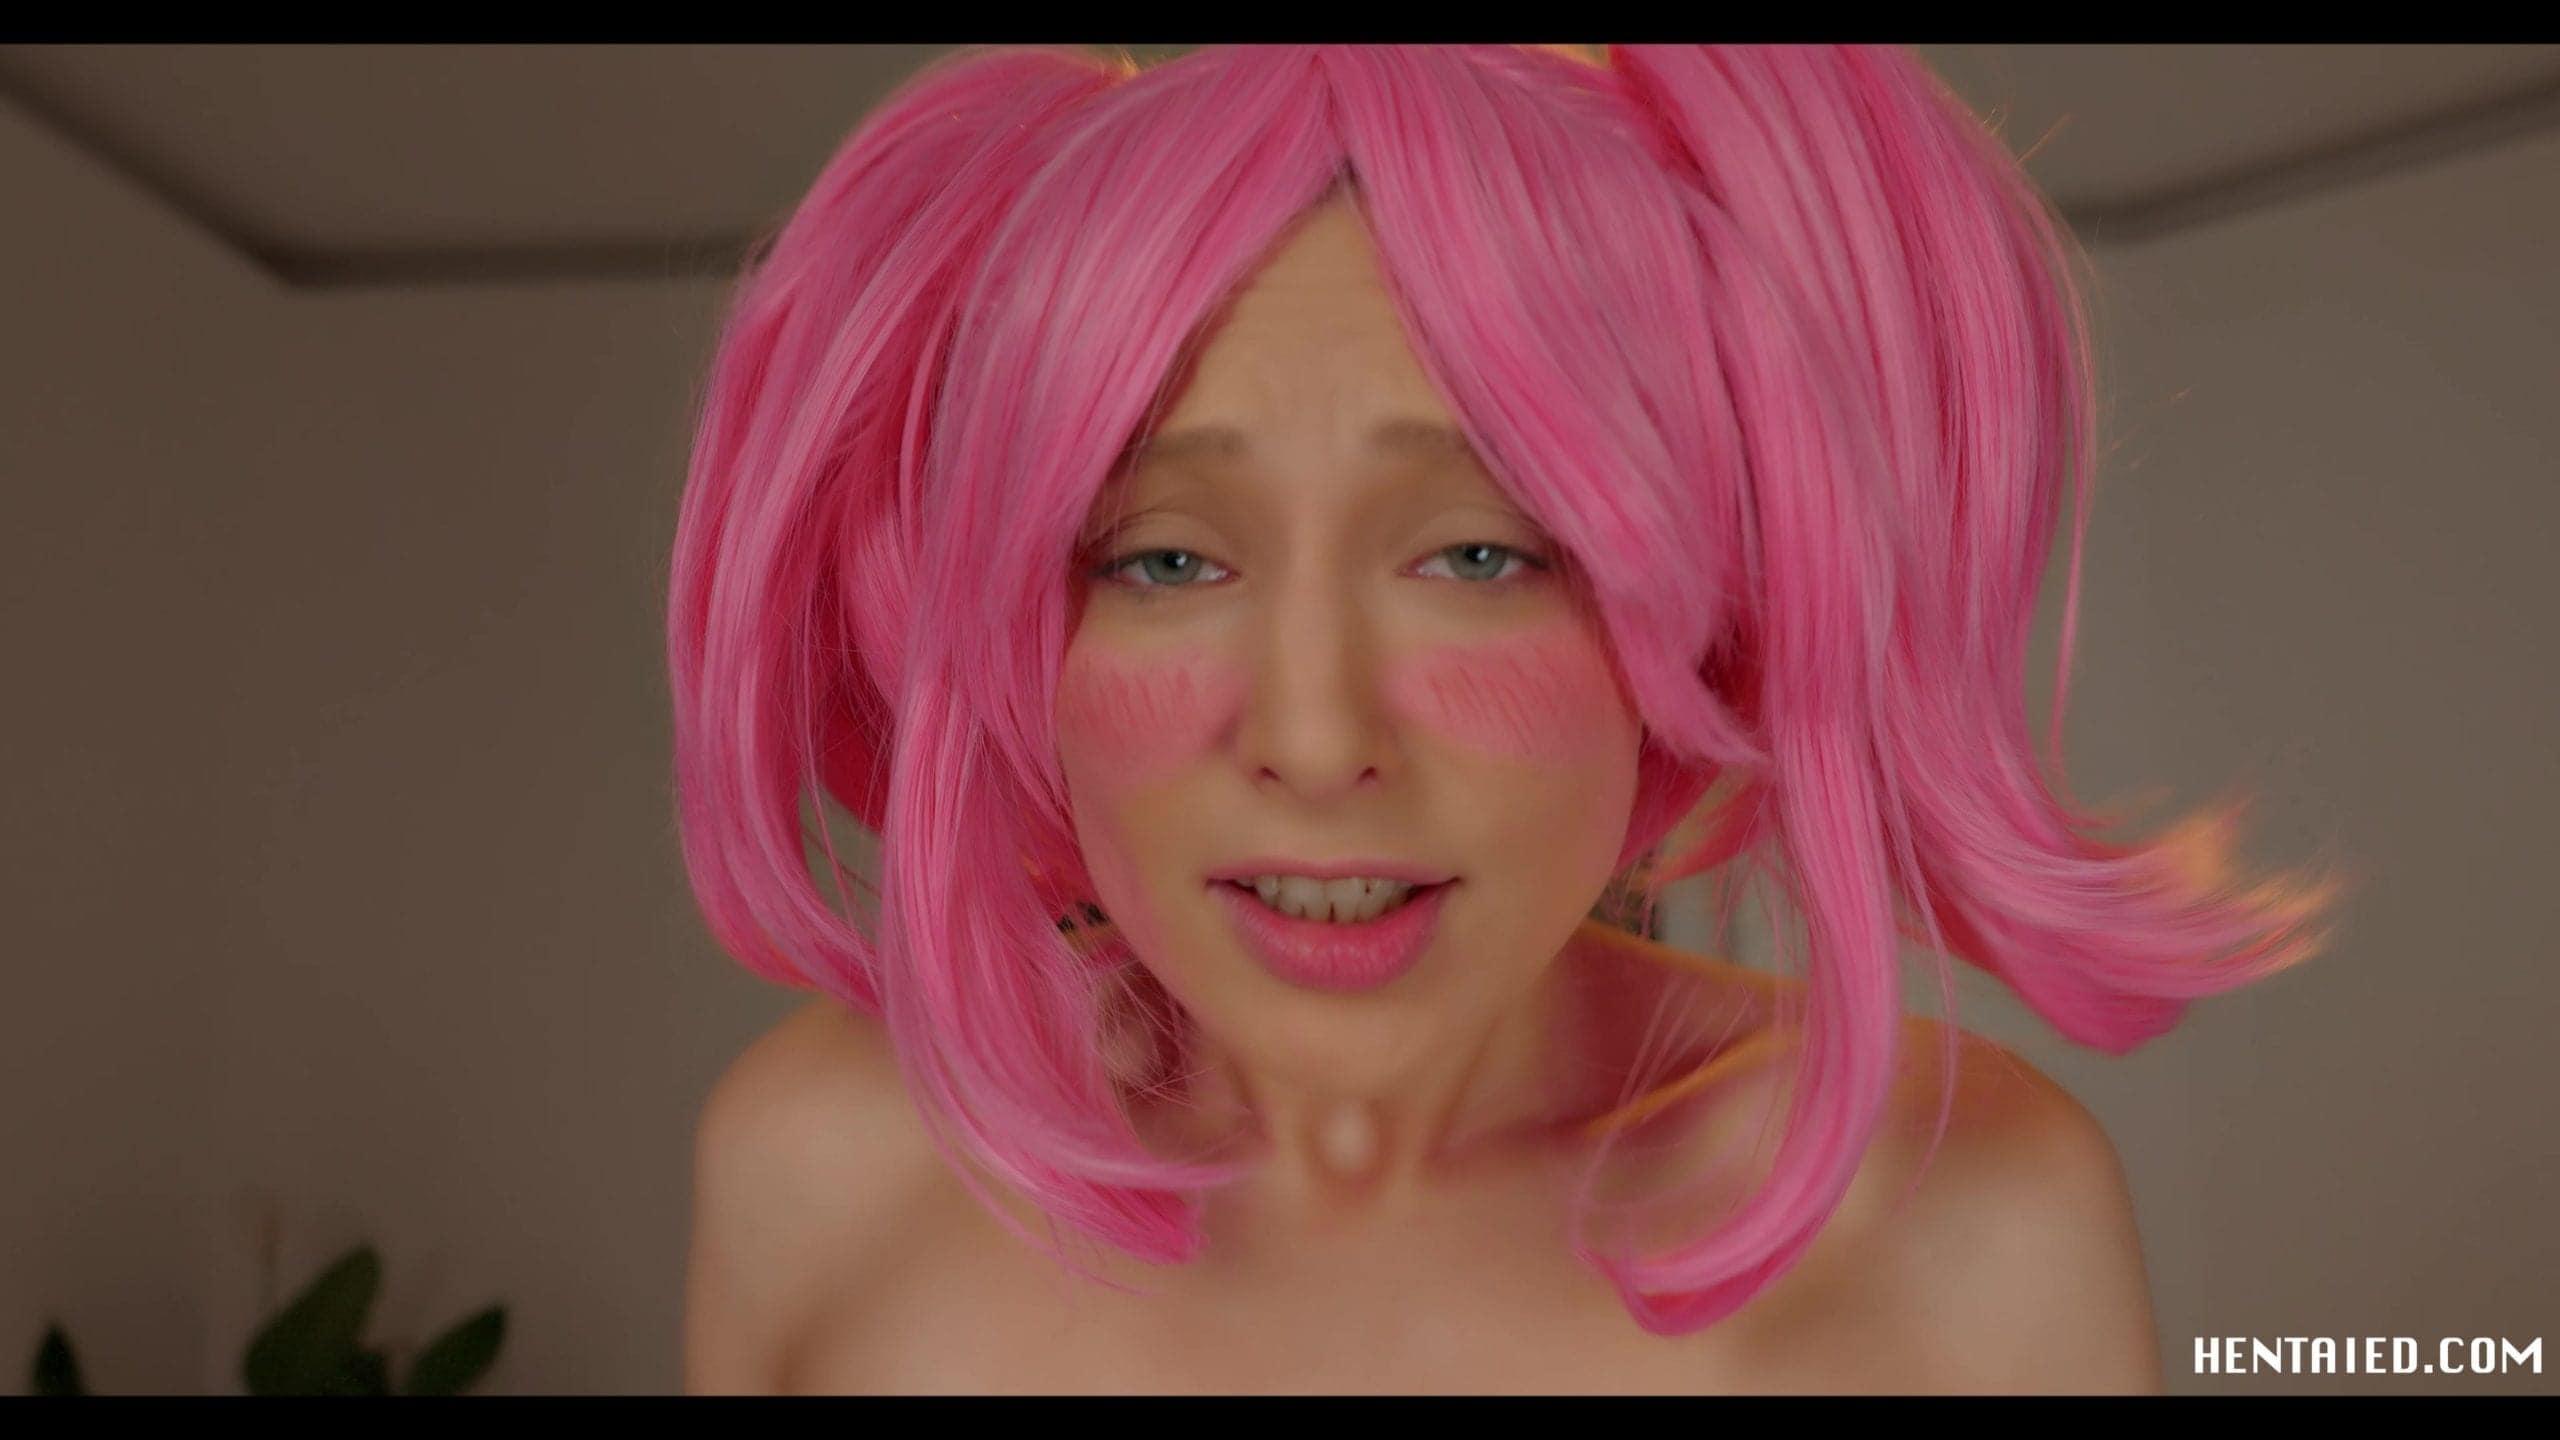 Talia Mint cosplay pornstar doing ahegao